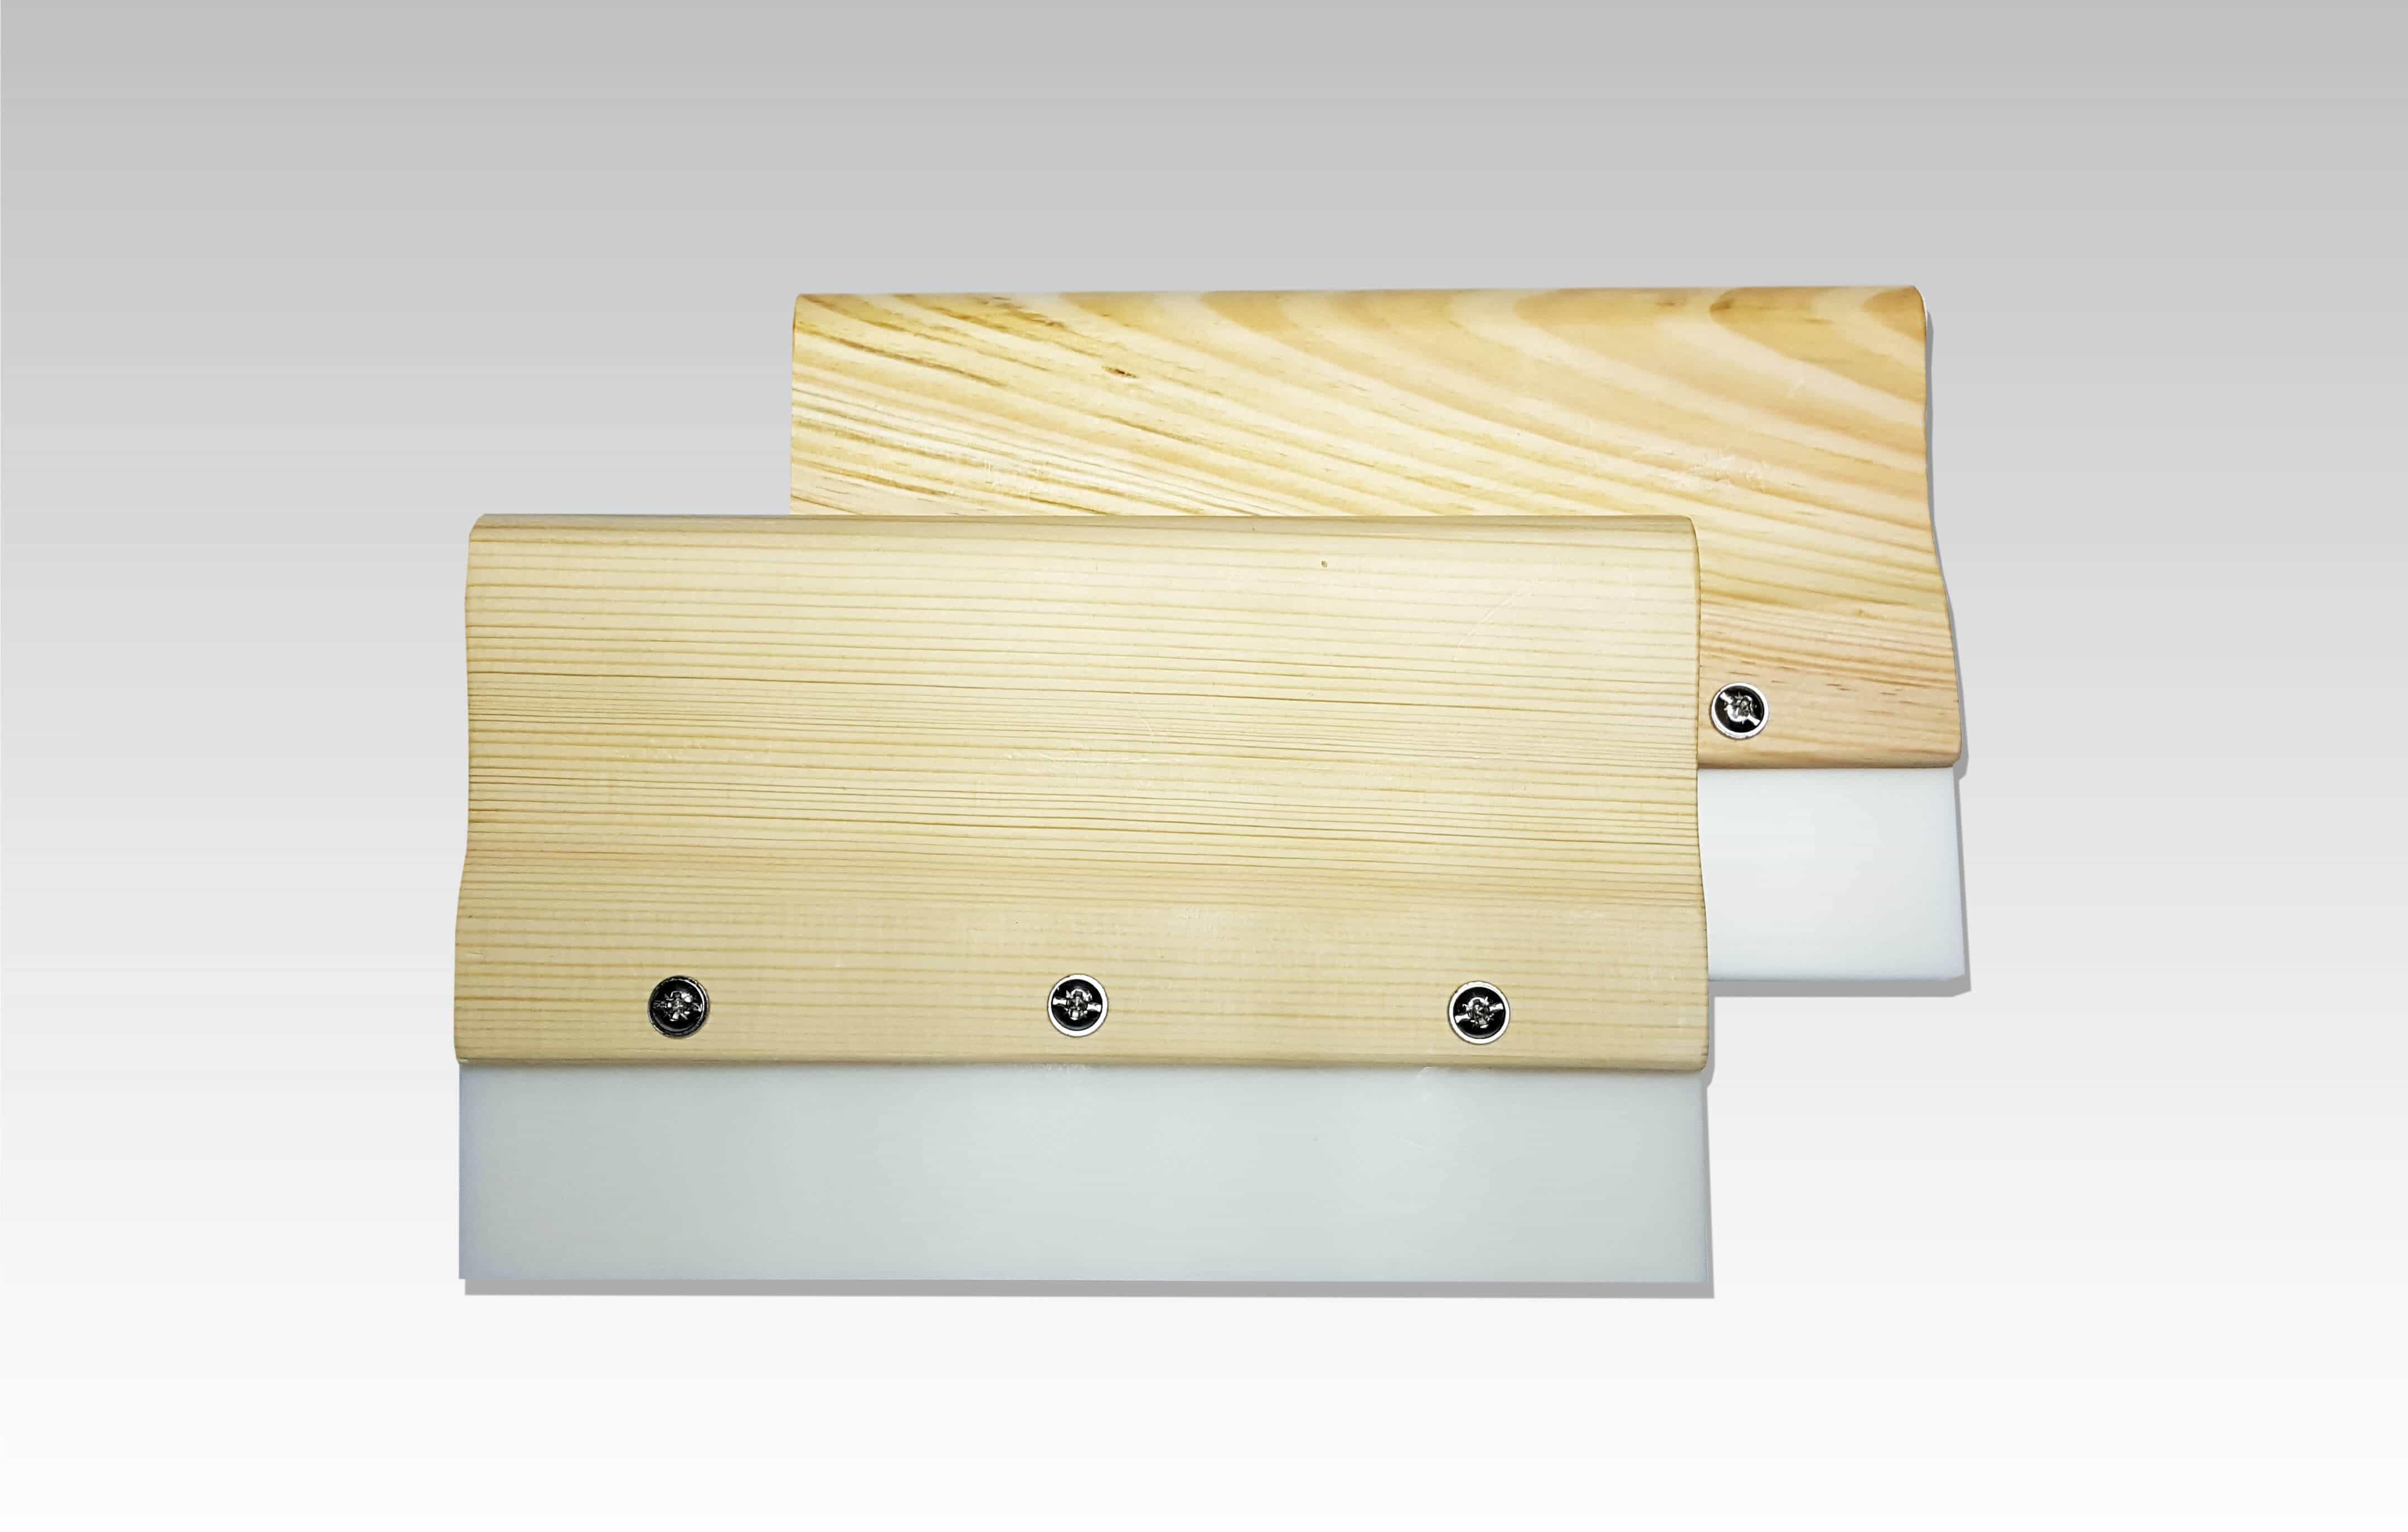 Holzrakel mit auswechselbarer Hartgummilippe